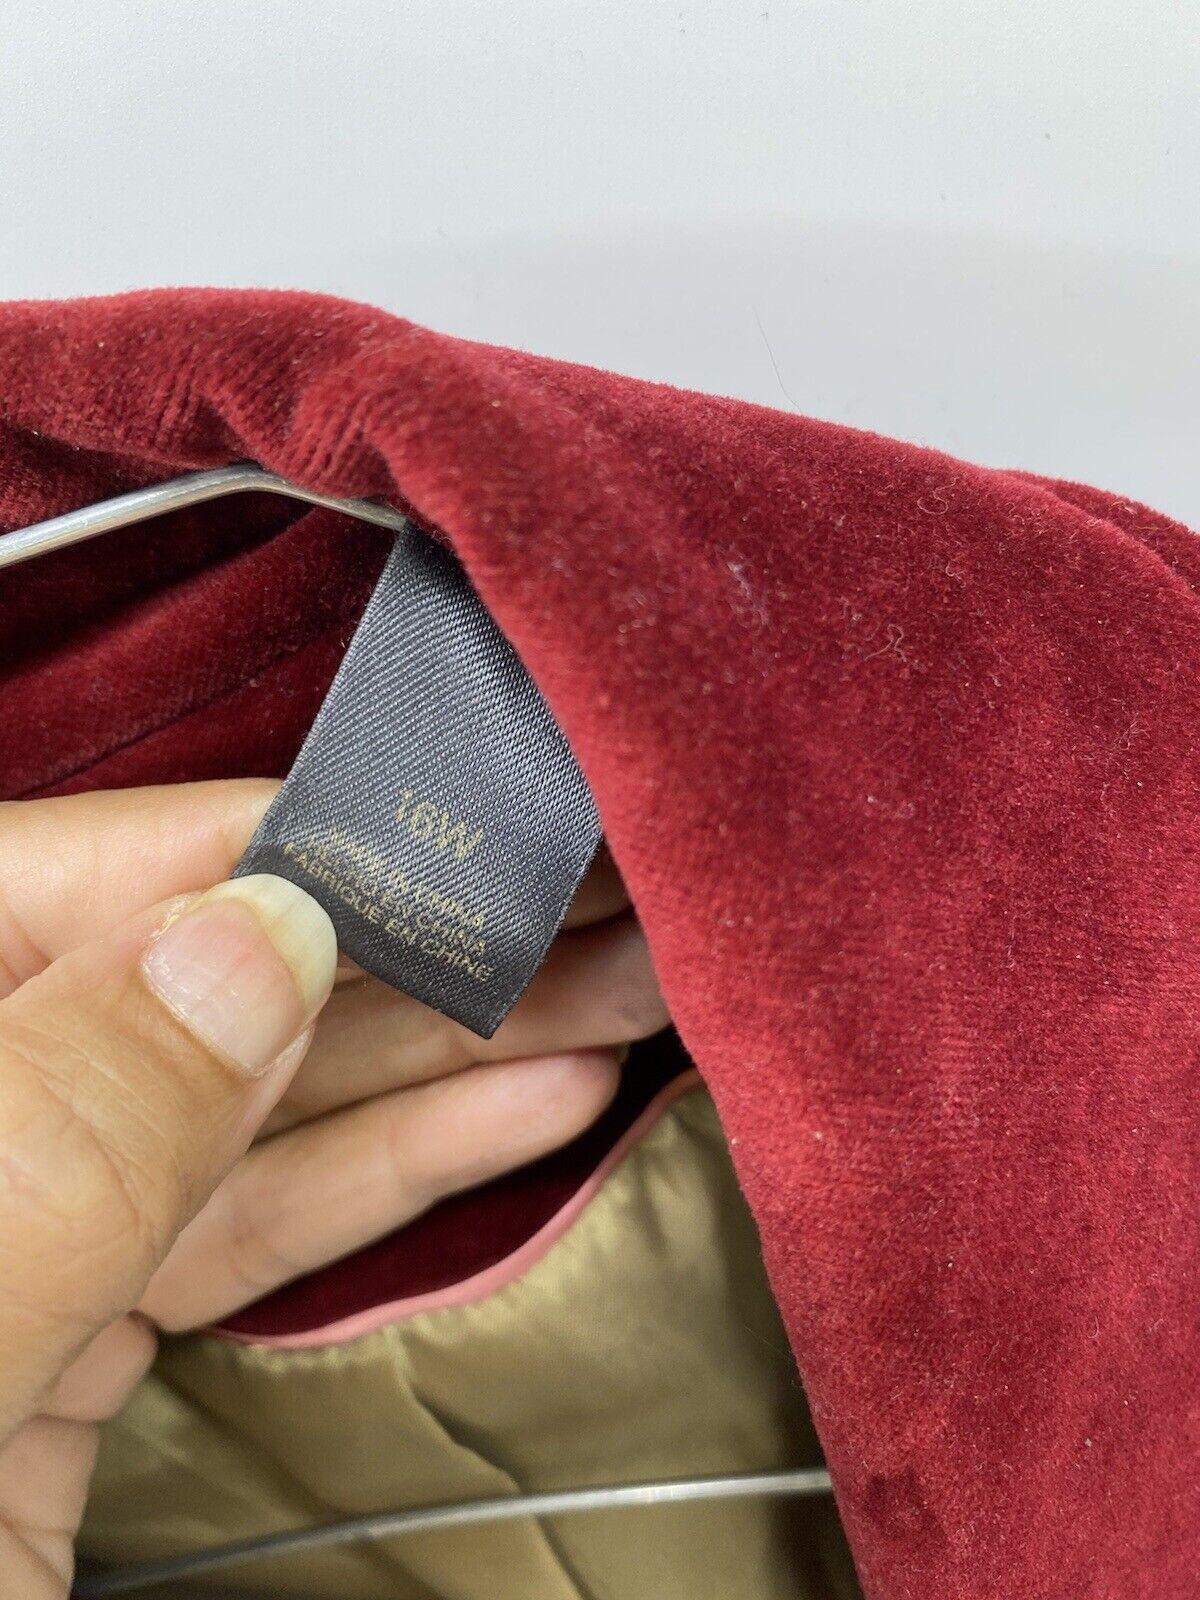 Liz Claiborne Red suede lined jacket/blazer Mediu… - image 5